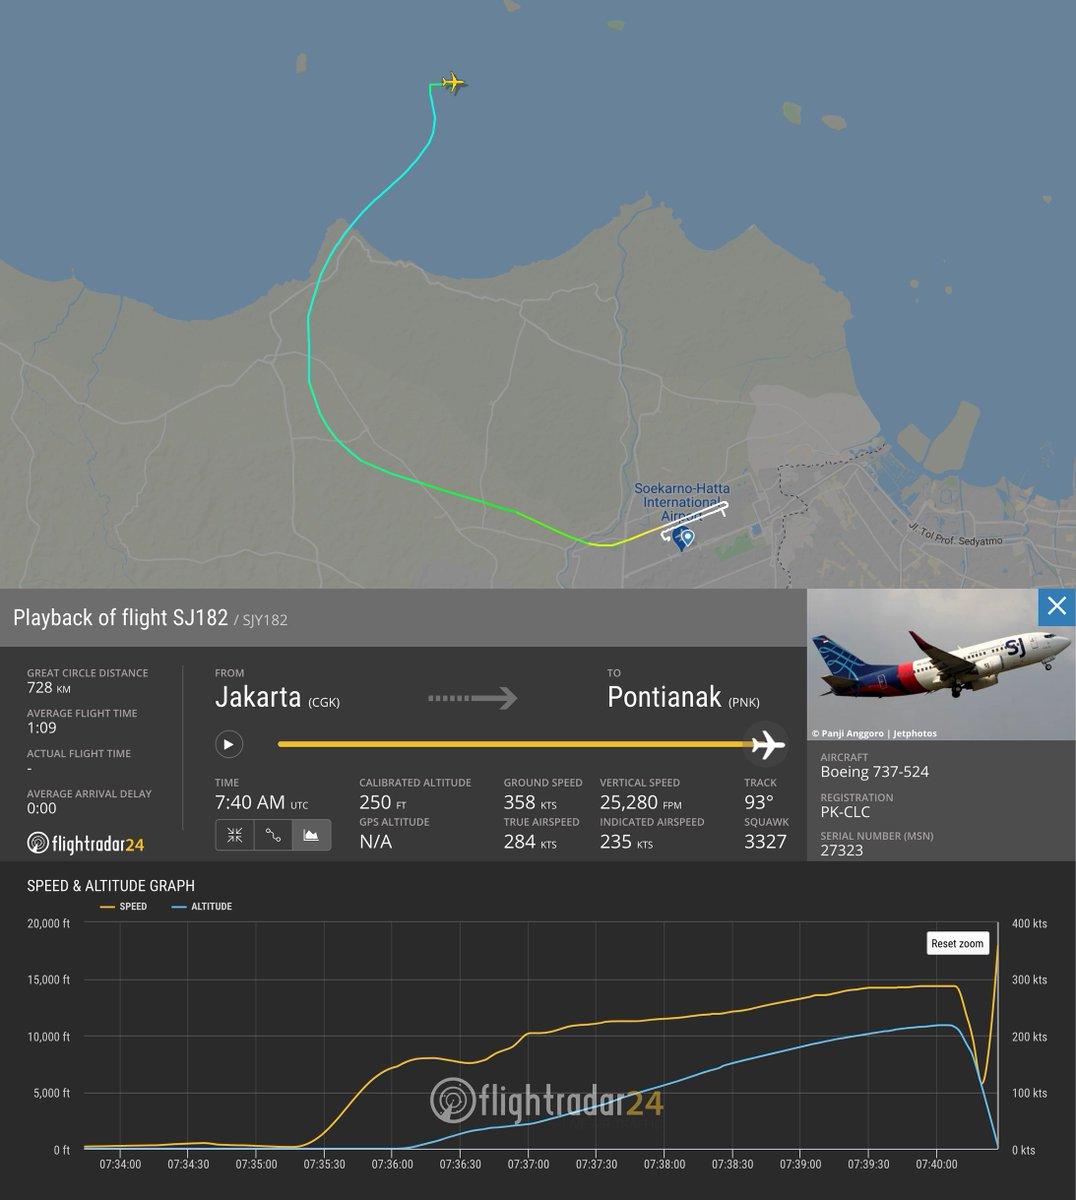 The latest data on #SJ182, now including processed granular ADS-B data. flightradar24.com/blog/sriwijaya…